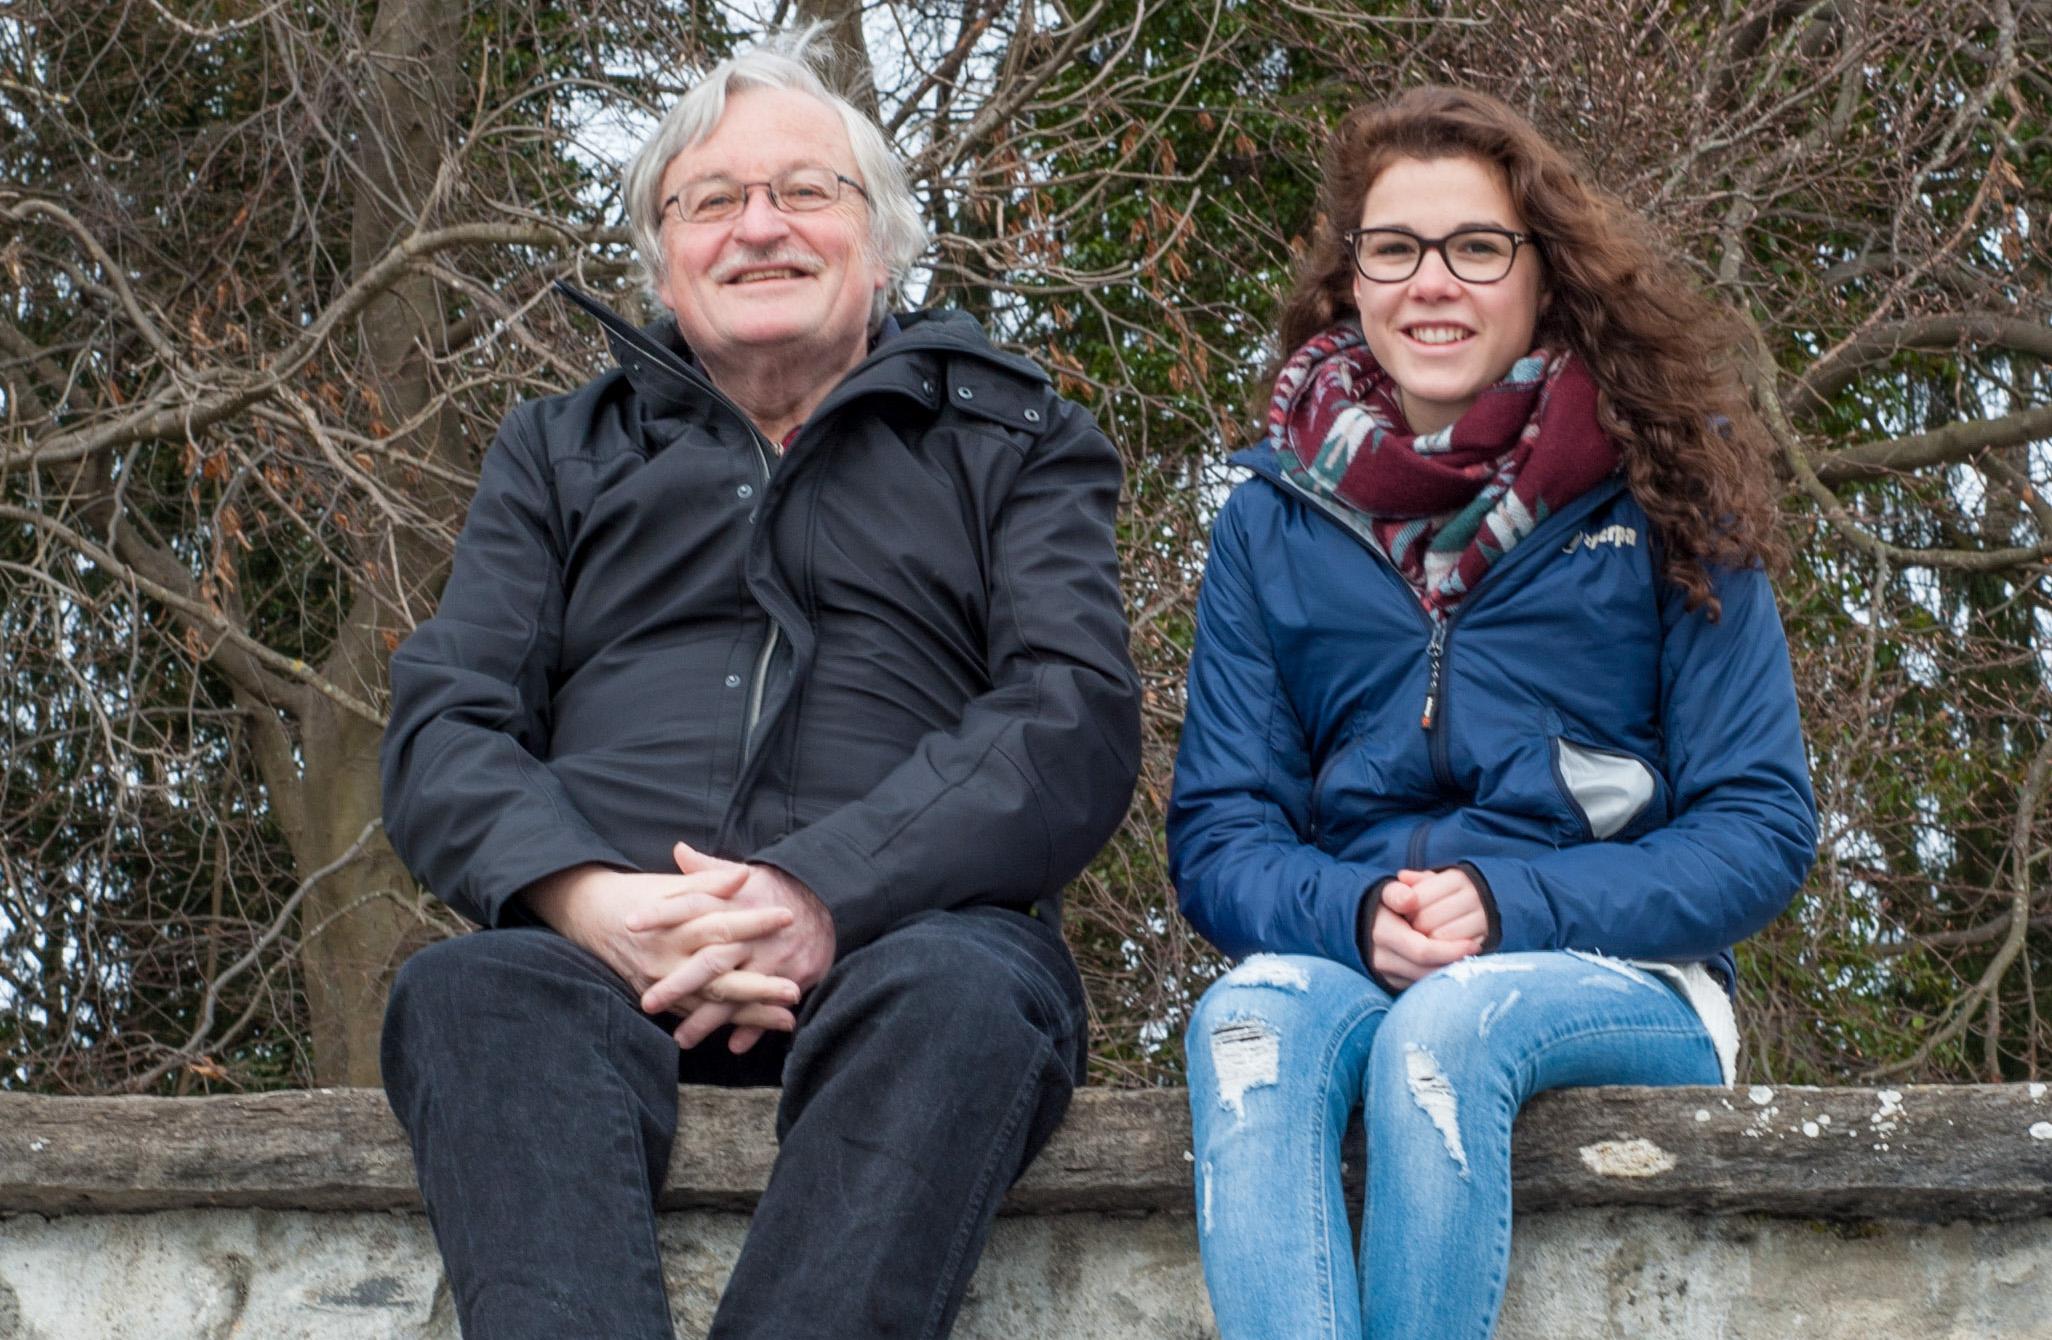 Lebenslust soziale Kontakte Schülerinnen Seniorinnen Geschichten Enkel Störenfriede Bus hüten Dialog